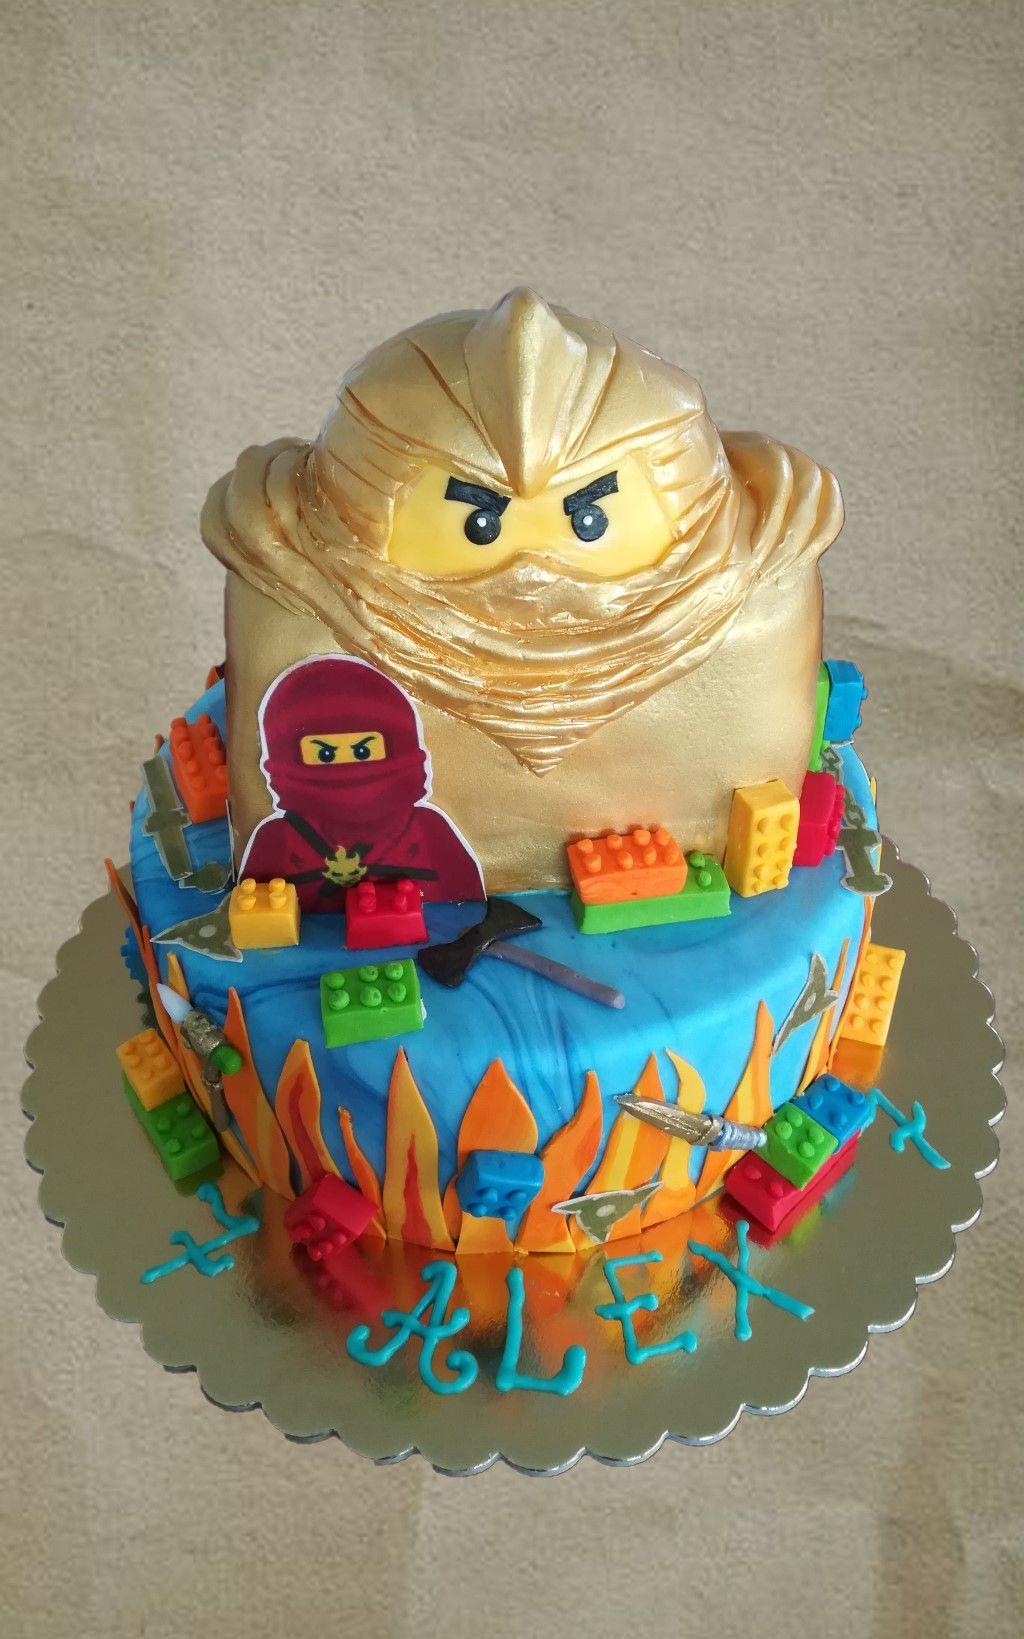 Lego Ninjago Cake